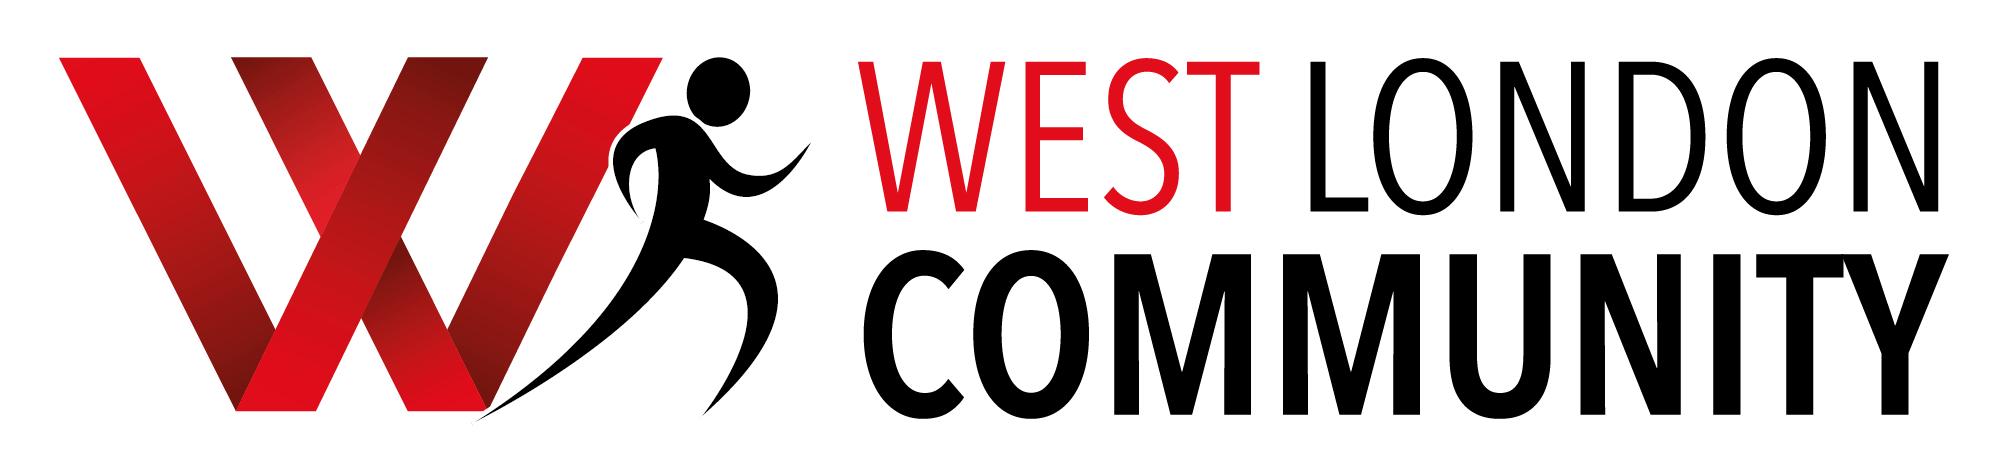 https://londonbroncosrl.com/wp-content/uploads/2021/03/WEST_LONDON_COMMUNITY_LOGO-WHITE-BACKGROUND.png